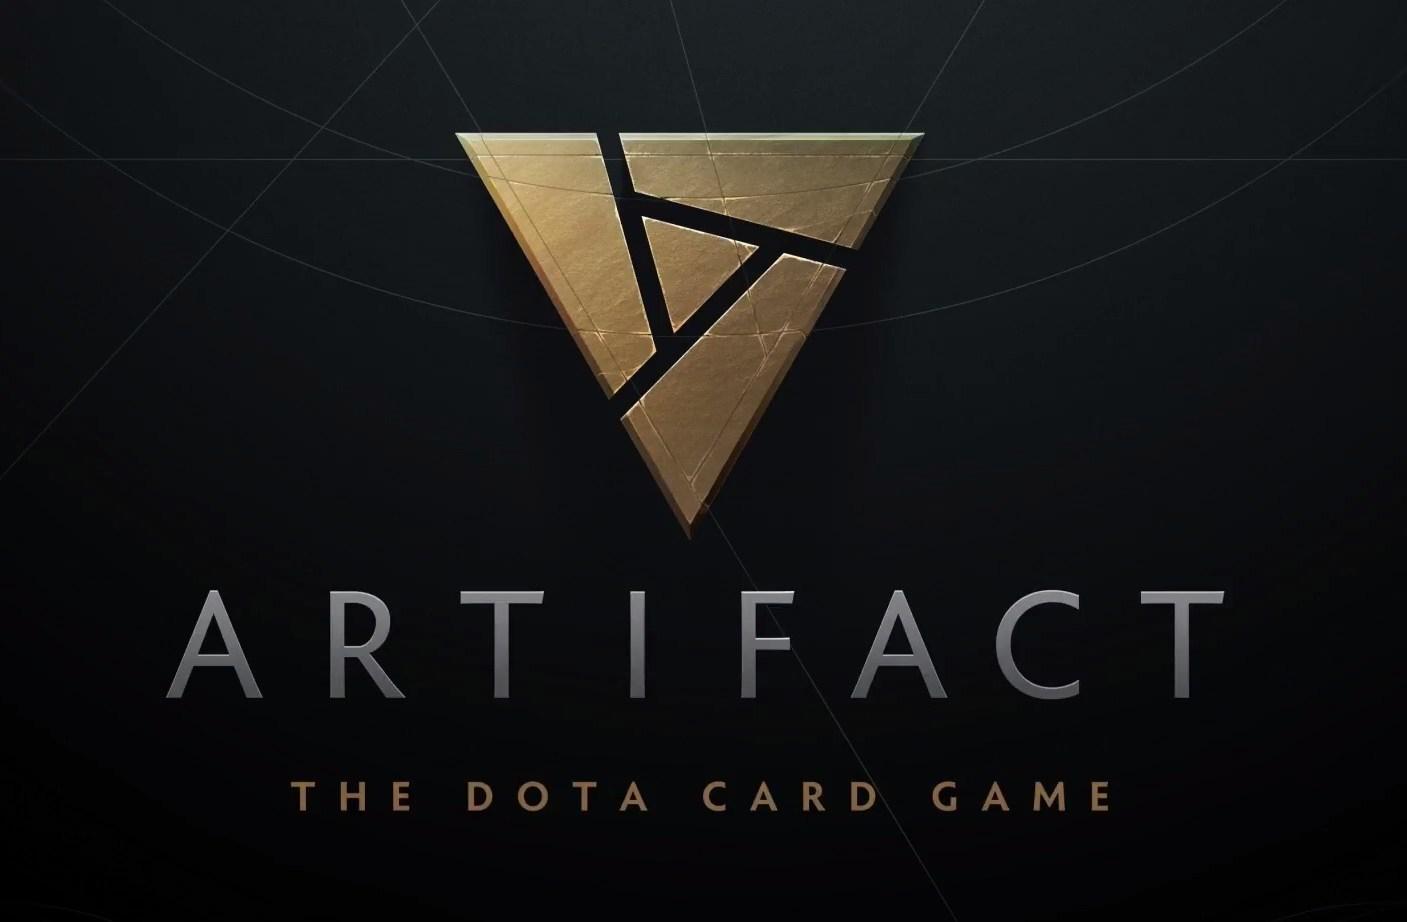 ot-artifact---the-dota-card-game